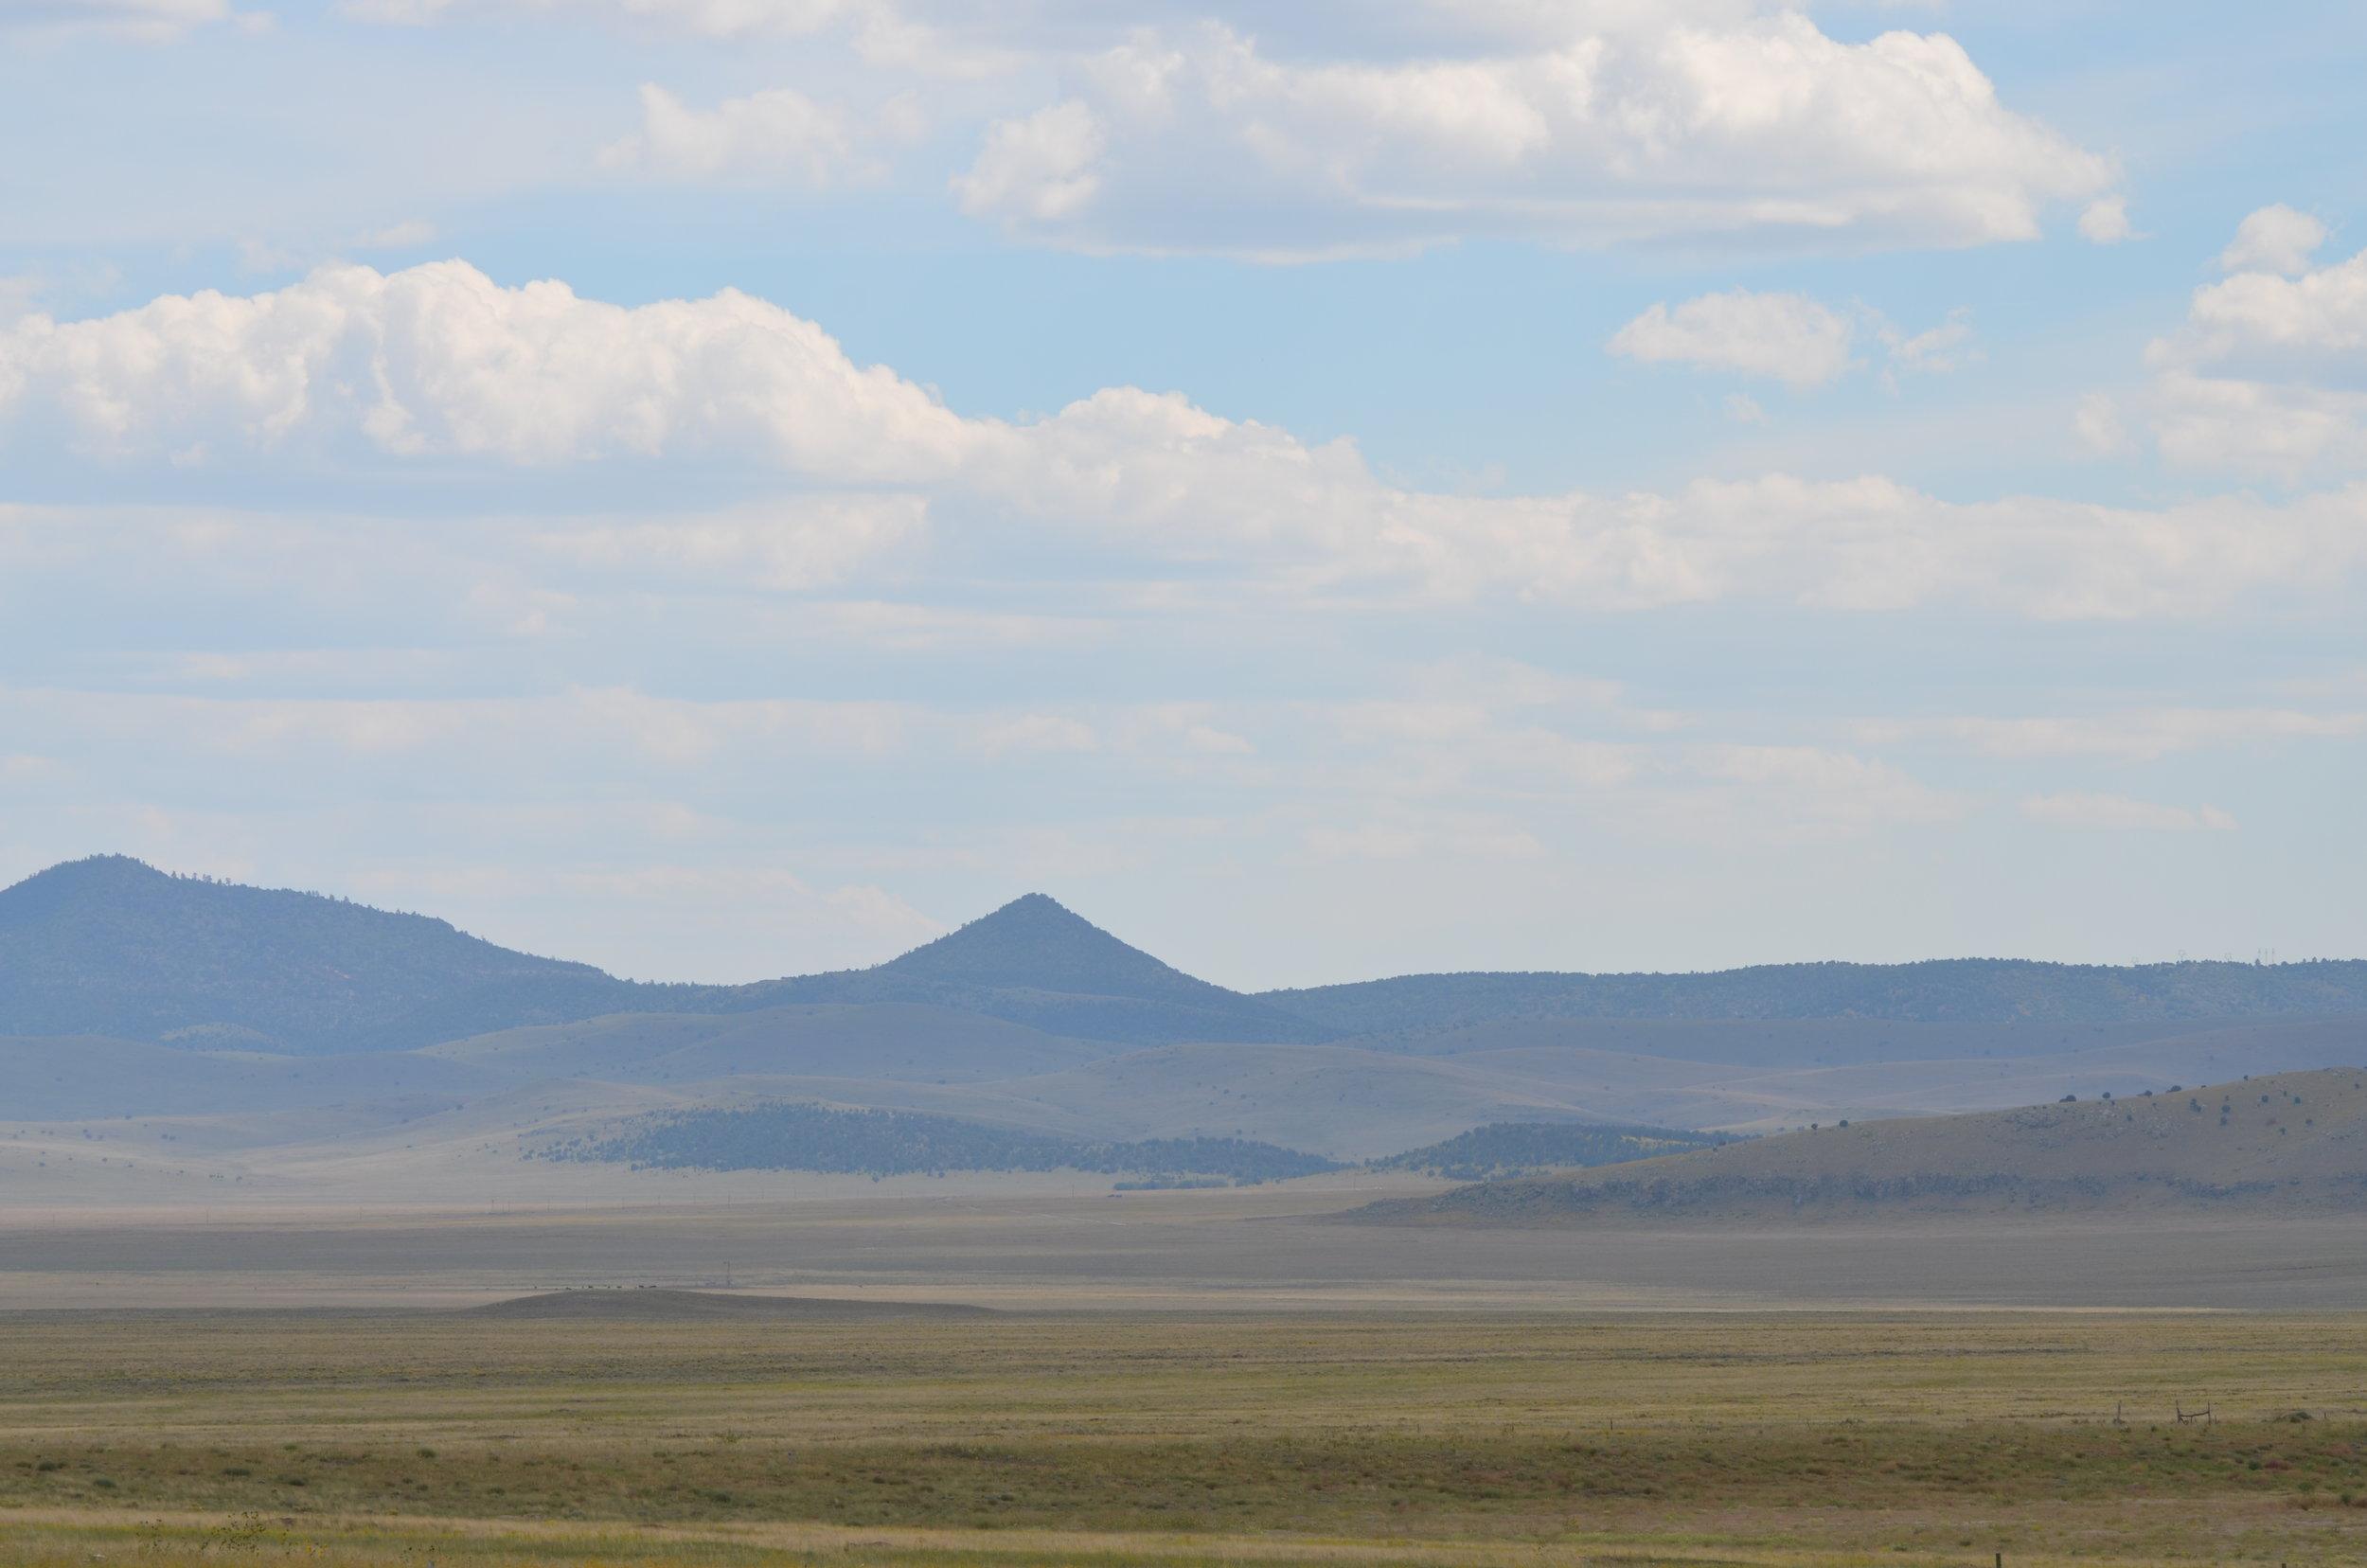 Blue Range Wolf Recovery Area. Photo by Cristina Eisenberg